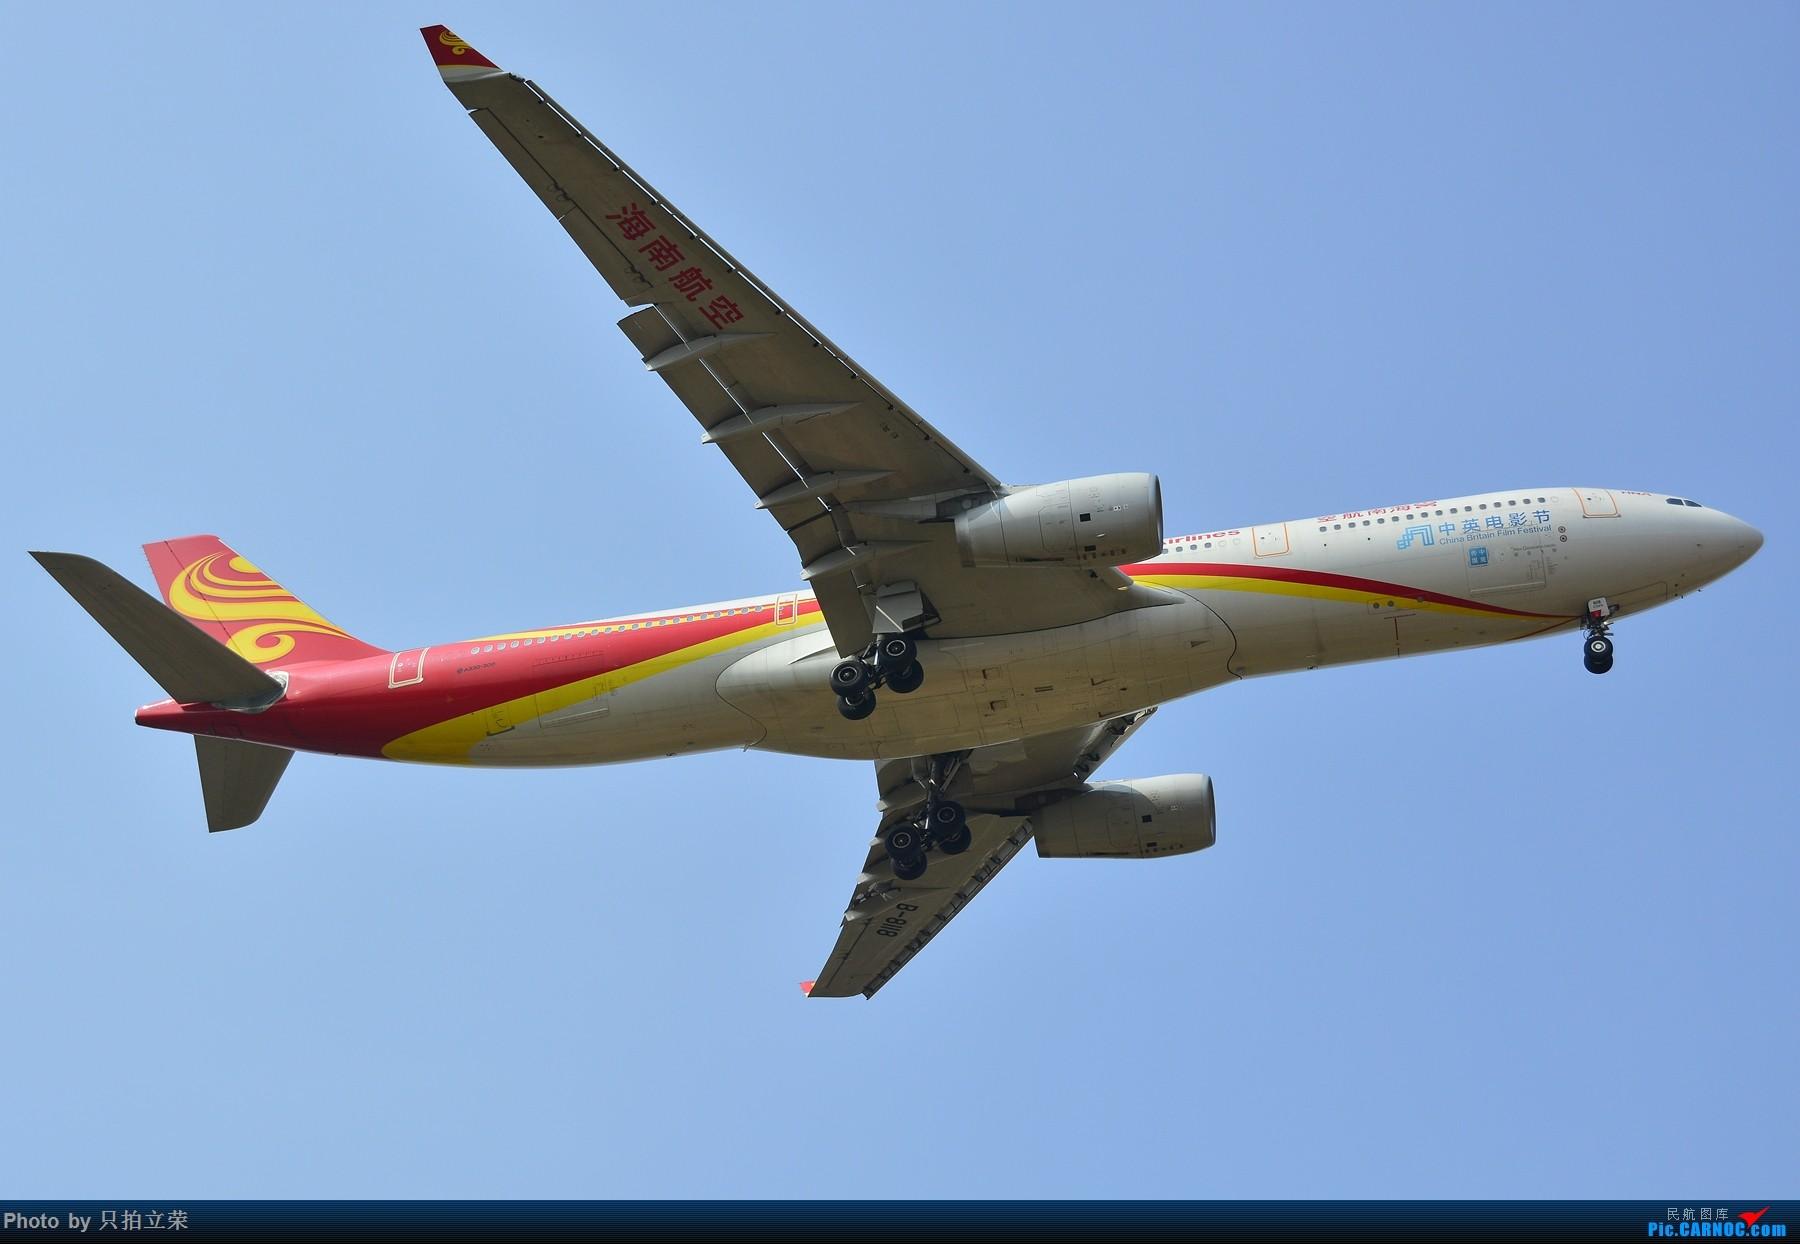 Re:[原创]湖南飞友会之10月9日长沙黄花好货满天飞! AIRBUS A330-300 B-8118 中国长沙黄花国际机场